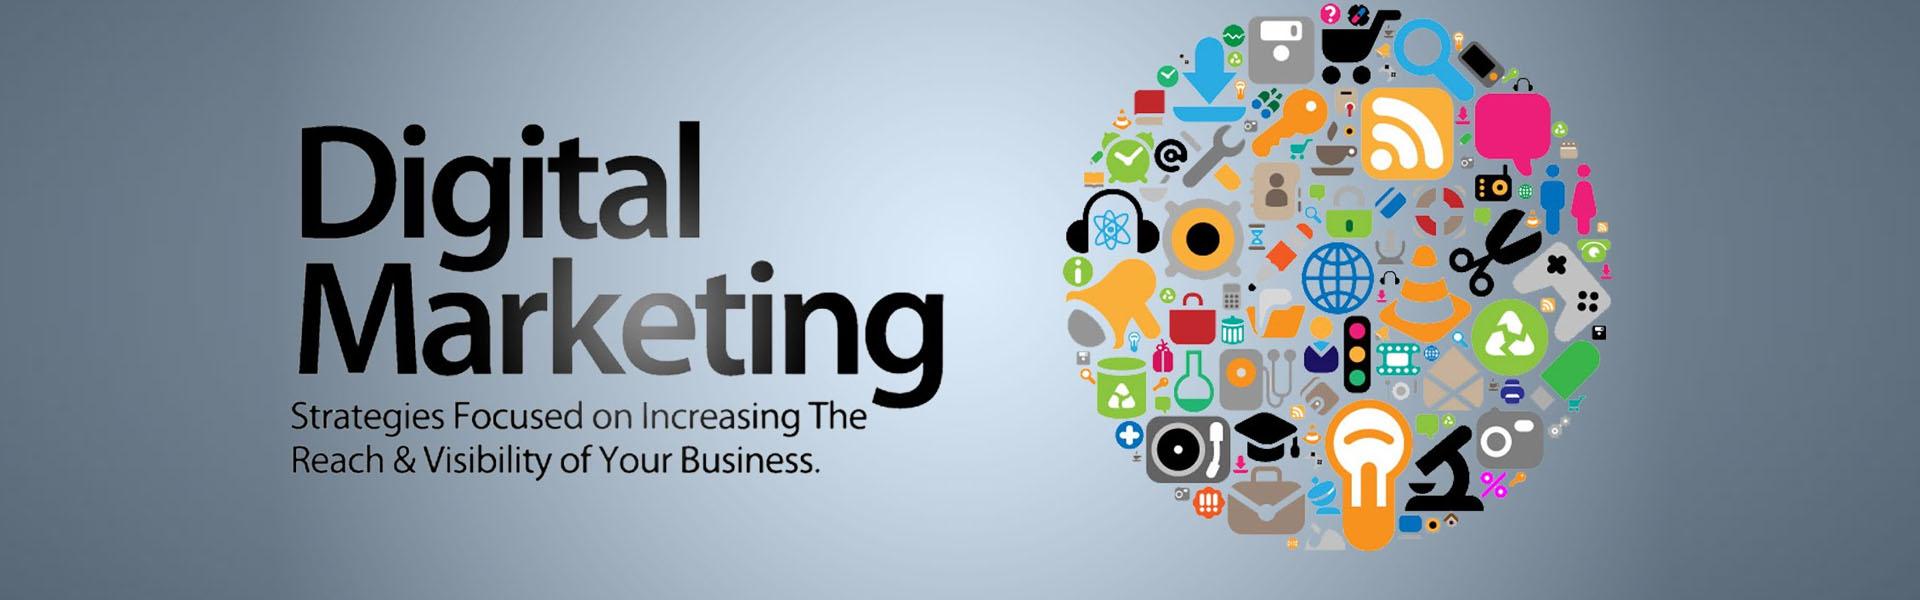 digital-marketing-indonesia-philippines